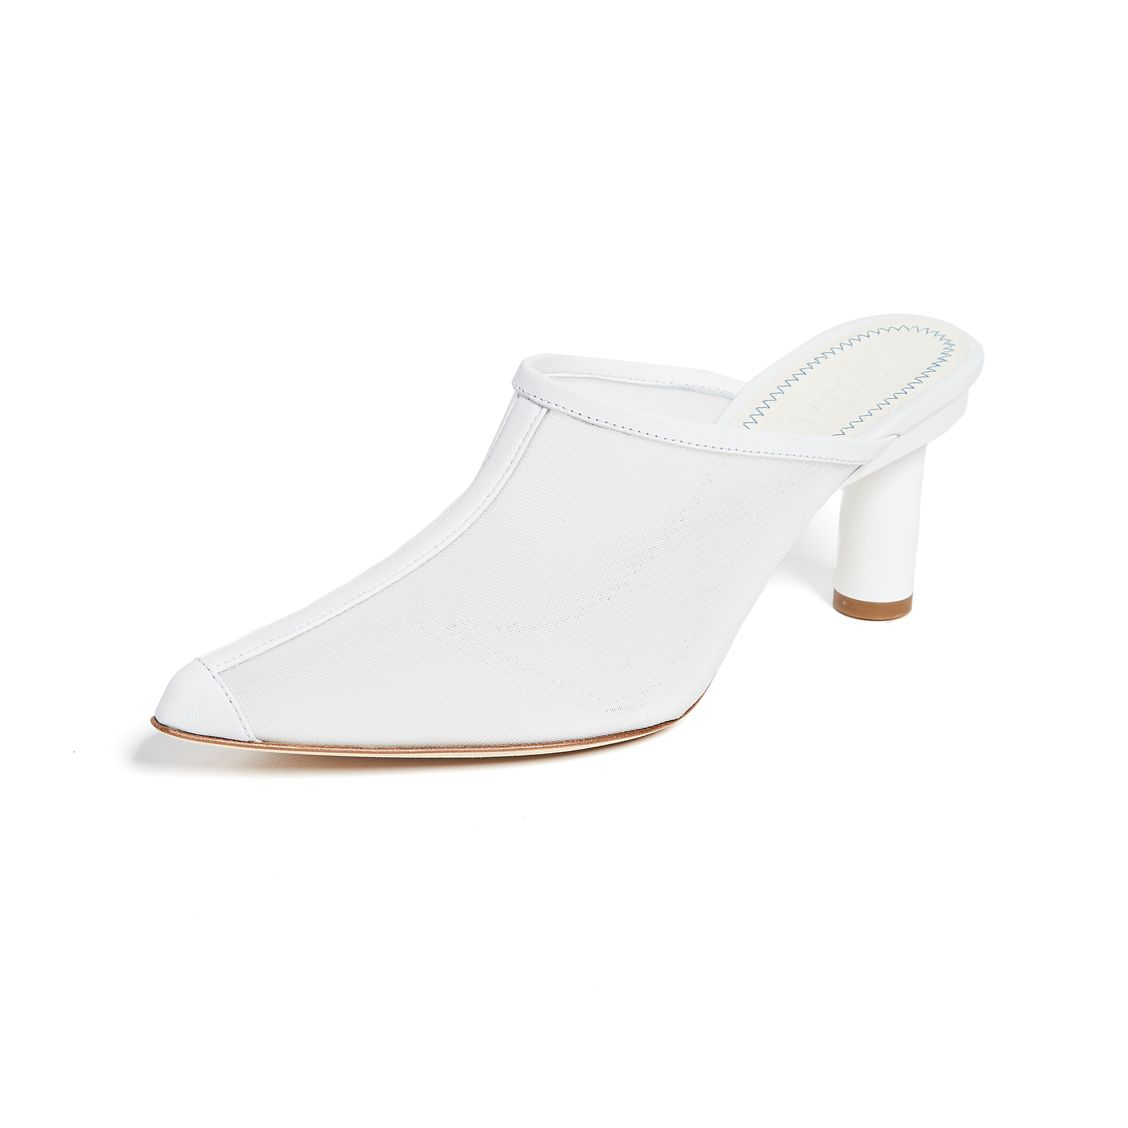 Victoria Beckham Took ... Victoria Beckham Shoes